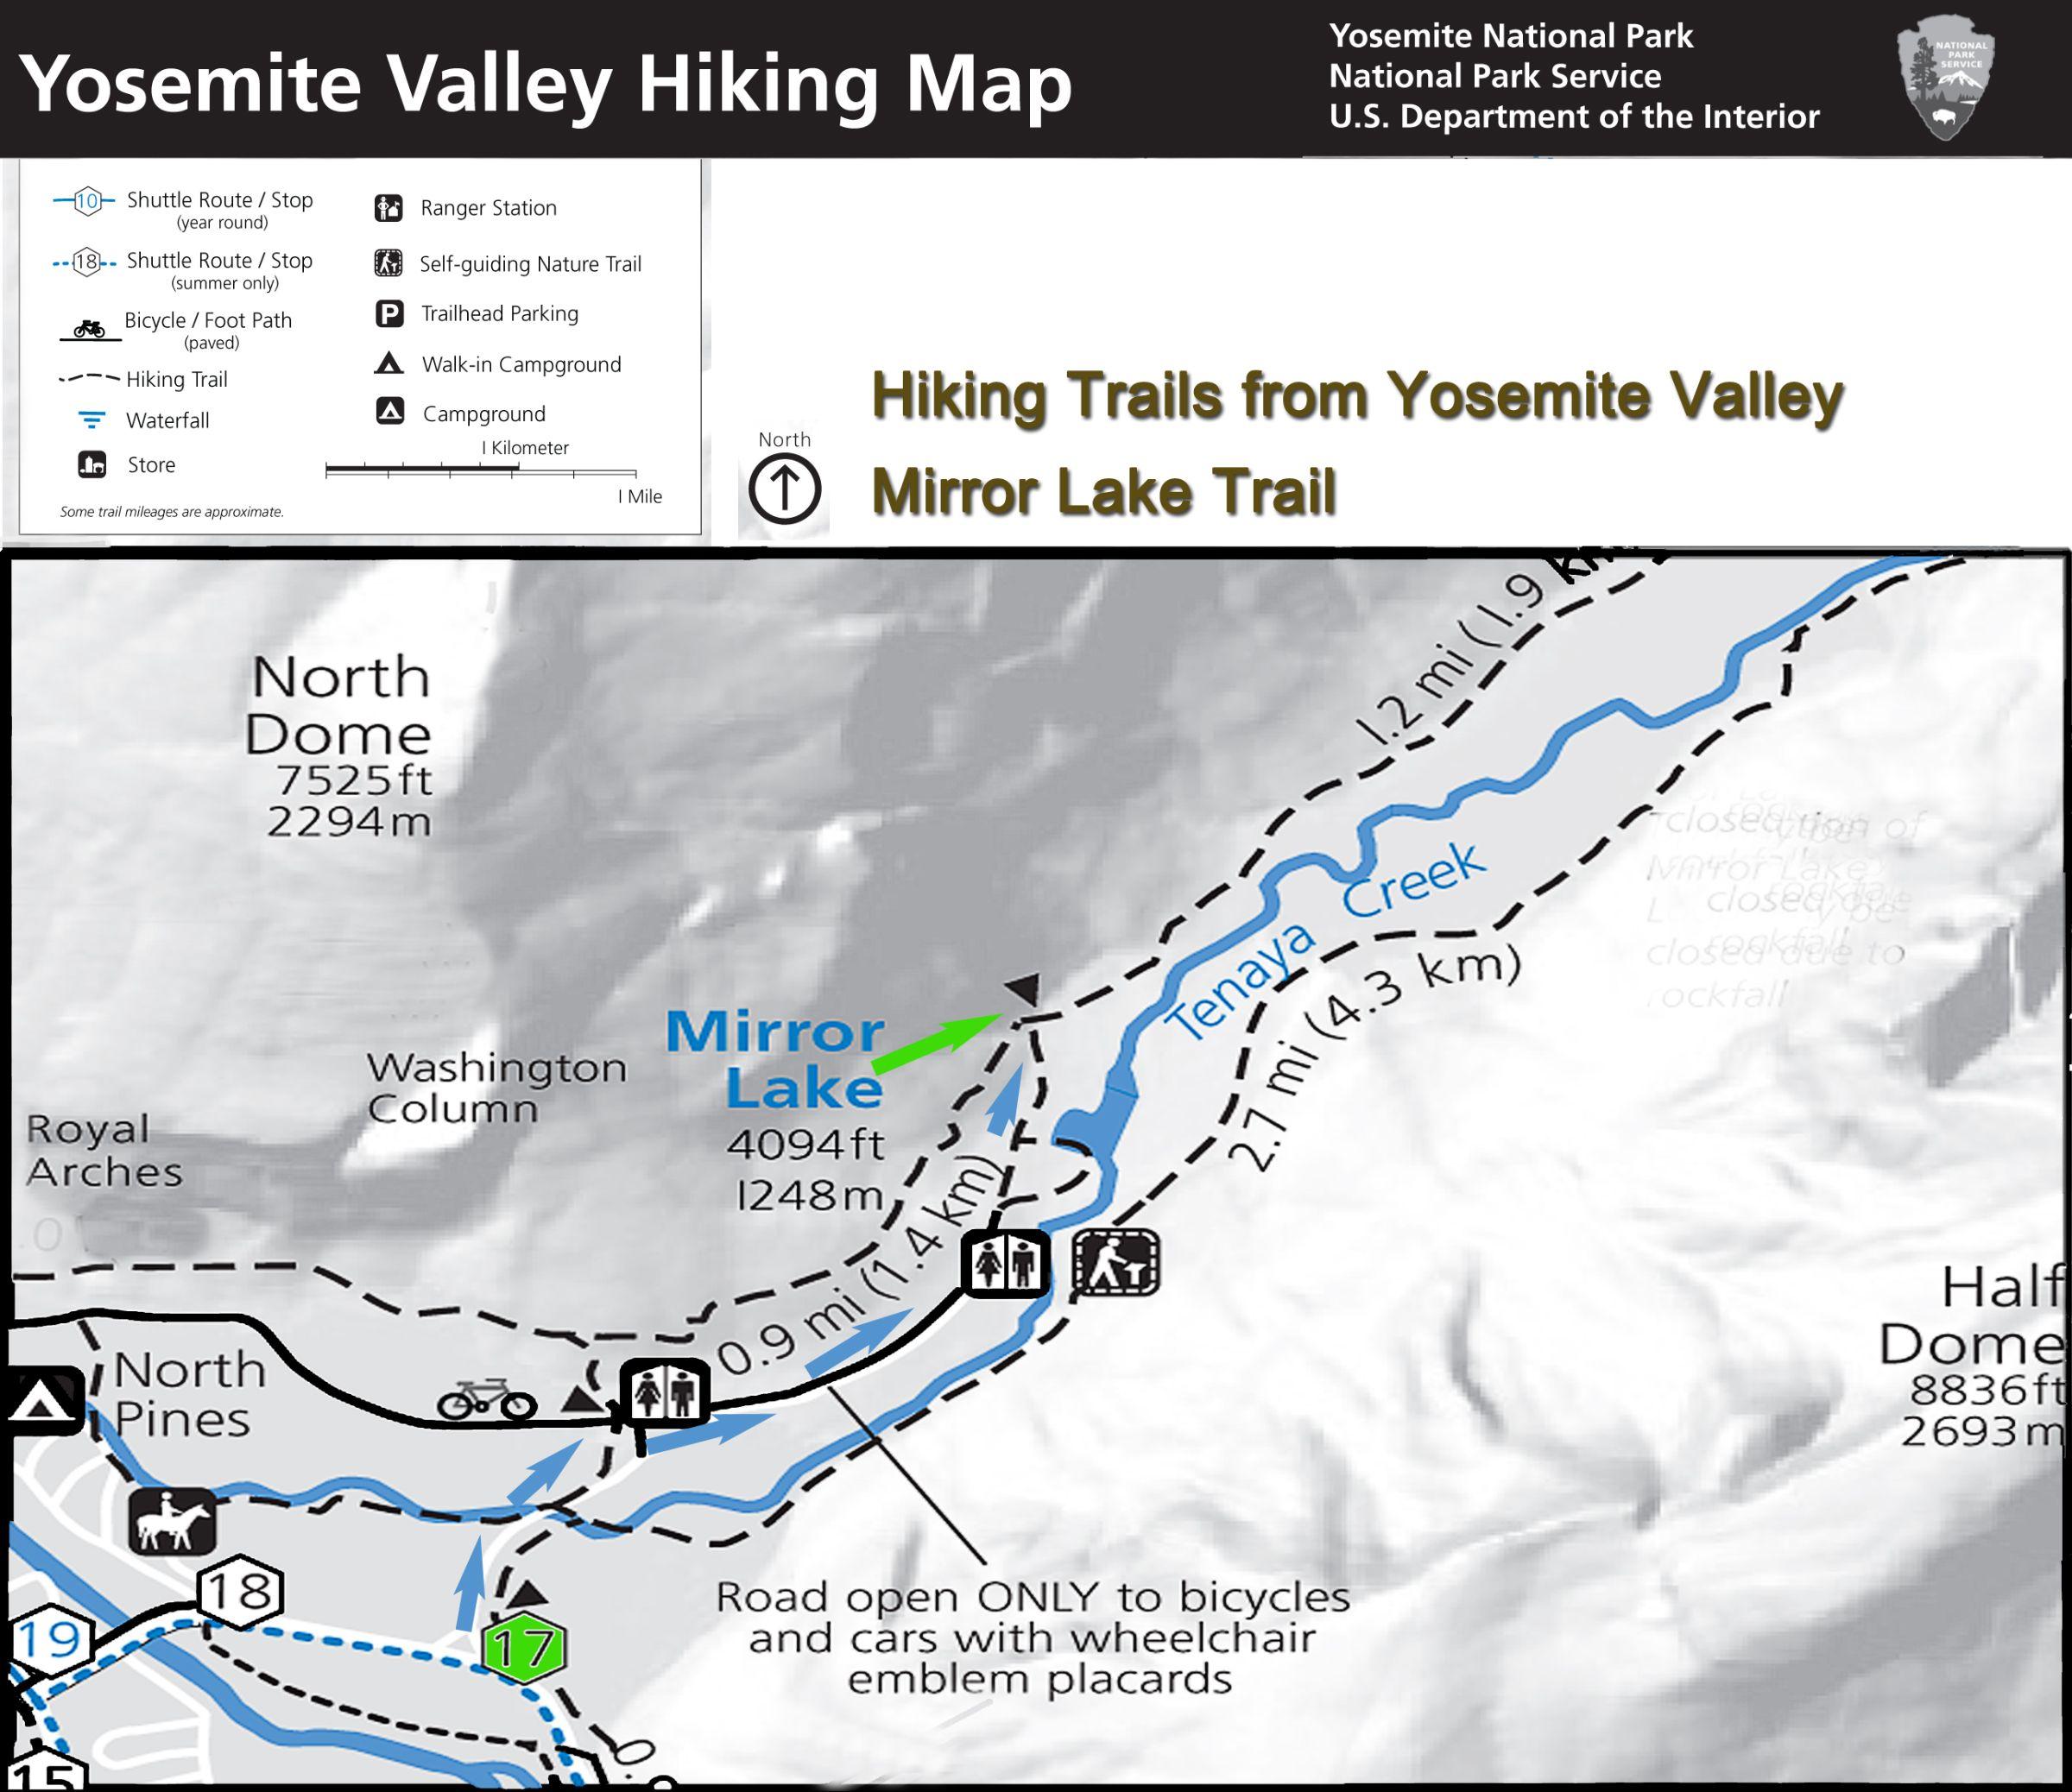 yosemite hiking map mirror lake trail the trail starts. Black Bedroom Furniture Sets. Home Design Ideas